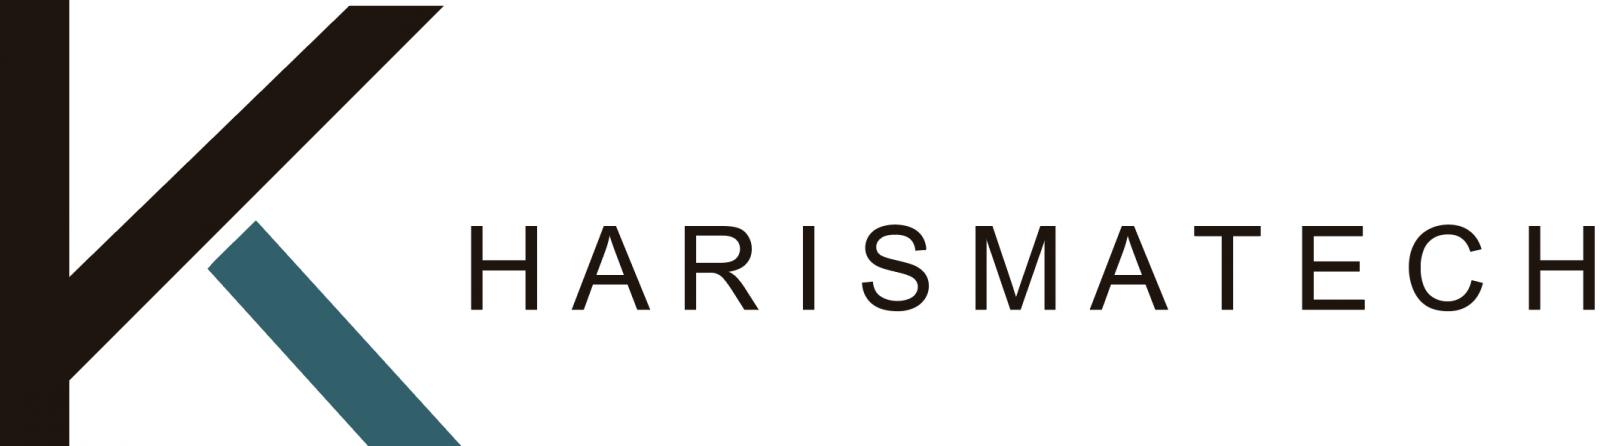 logo kharismatech